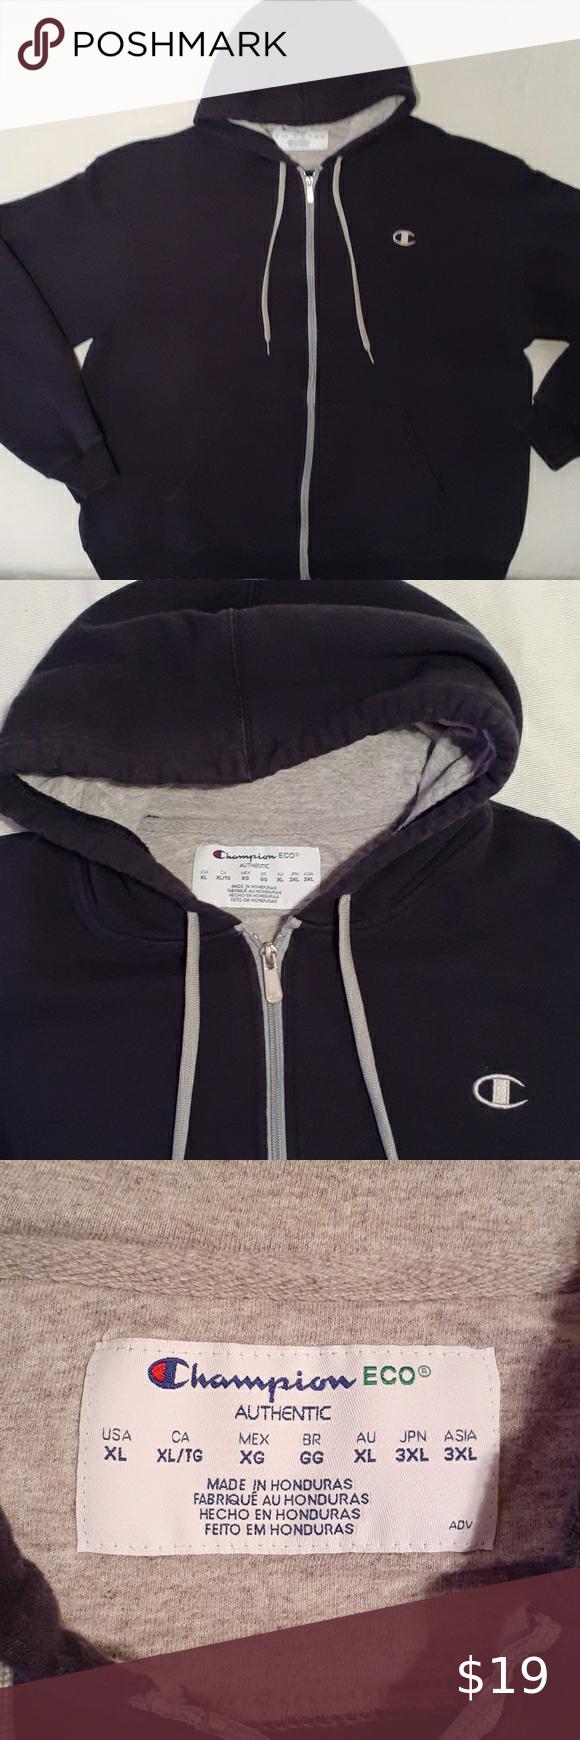 Champion Eco Authentic Hooded Sweatshirt Hooded Sweatshirts Clothes Design Sweatshirts [ 1740 x 580 Pixel ]